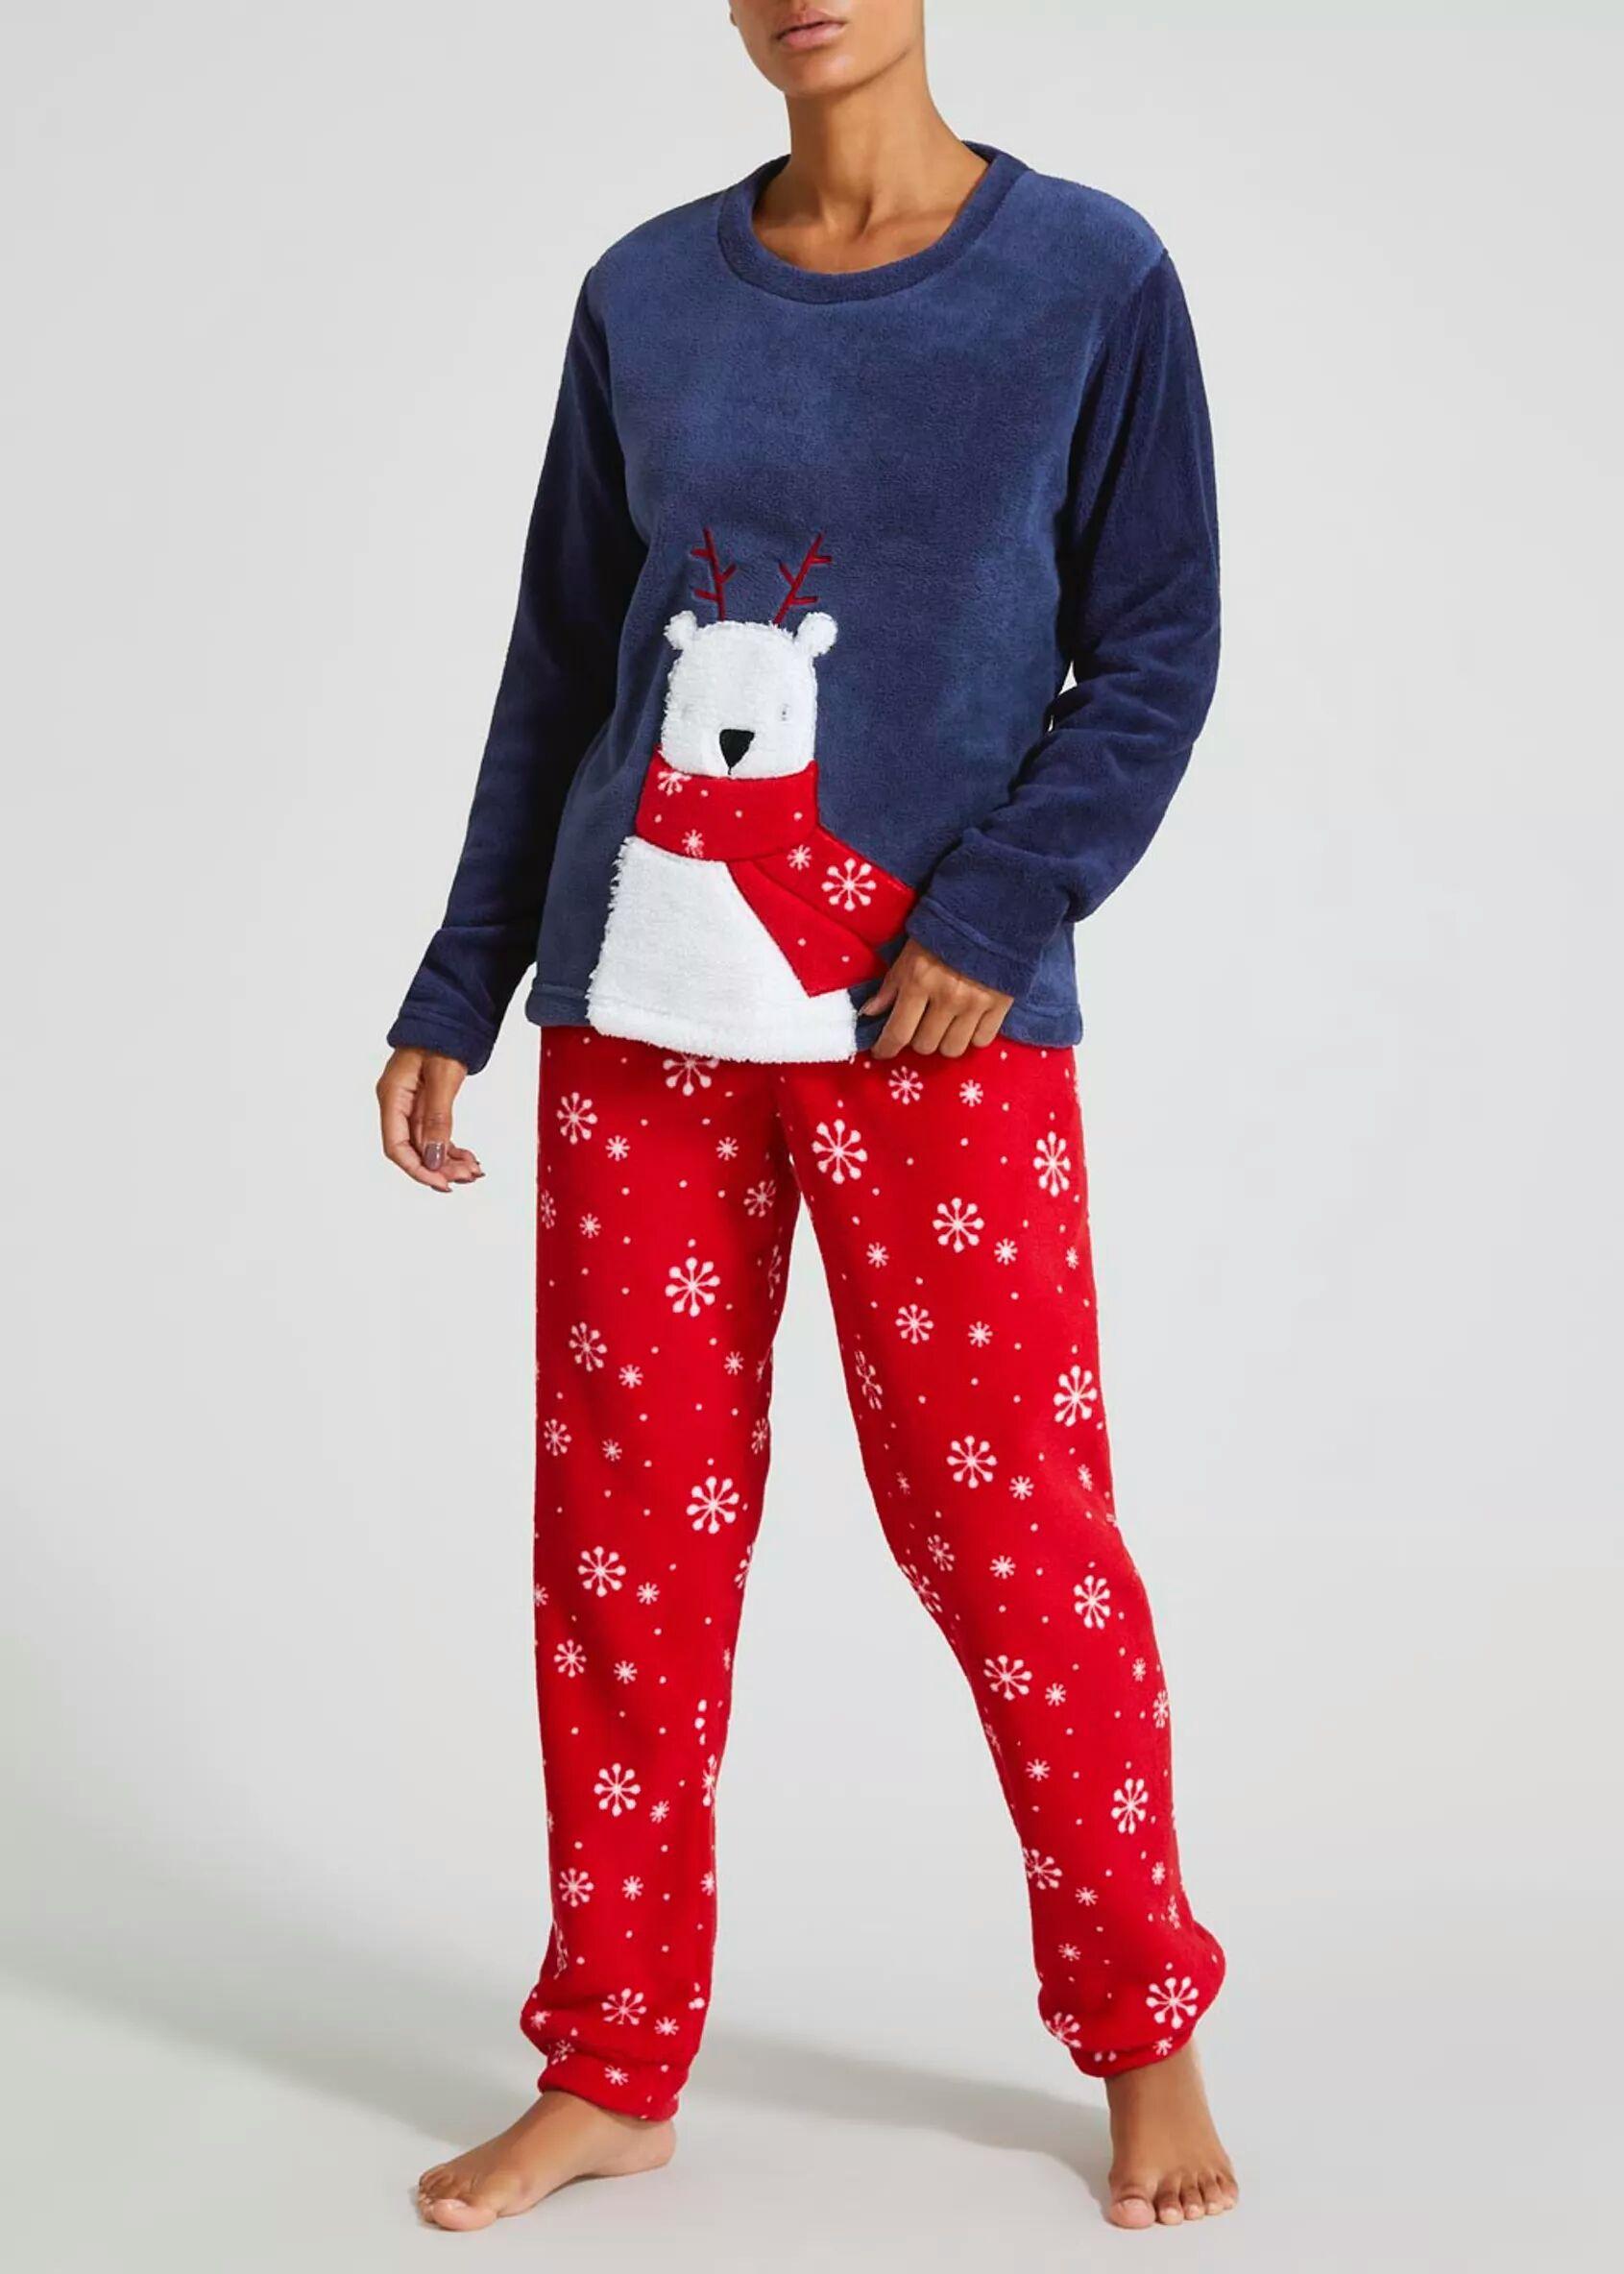 Women's fleece pyjamas £6.00 instore @ Matalan